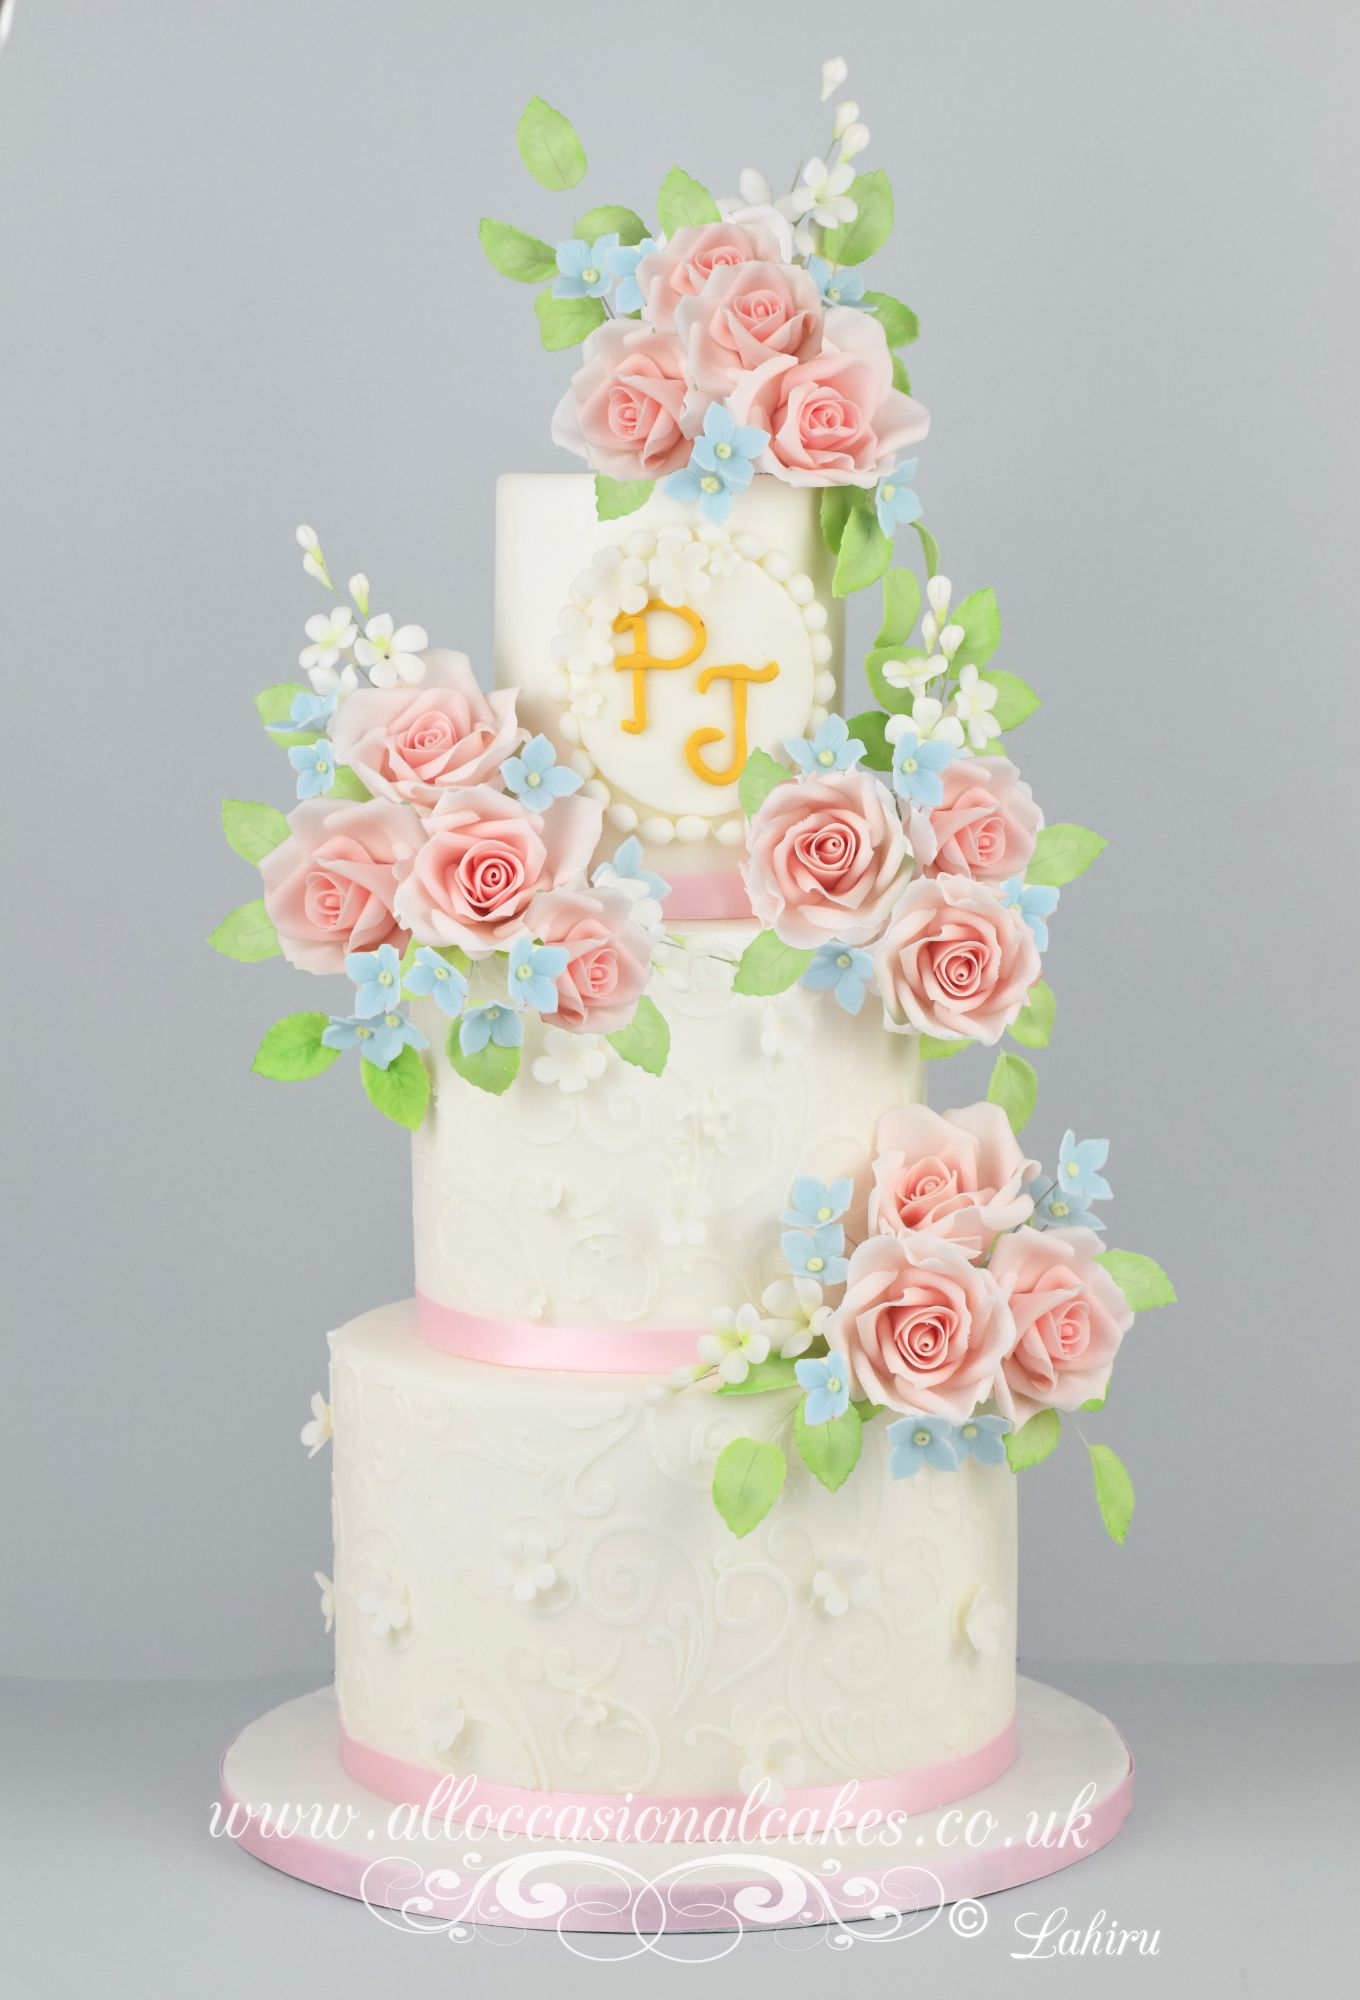 creamy peach wedding cake,Wedding cakes Downend